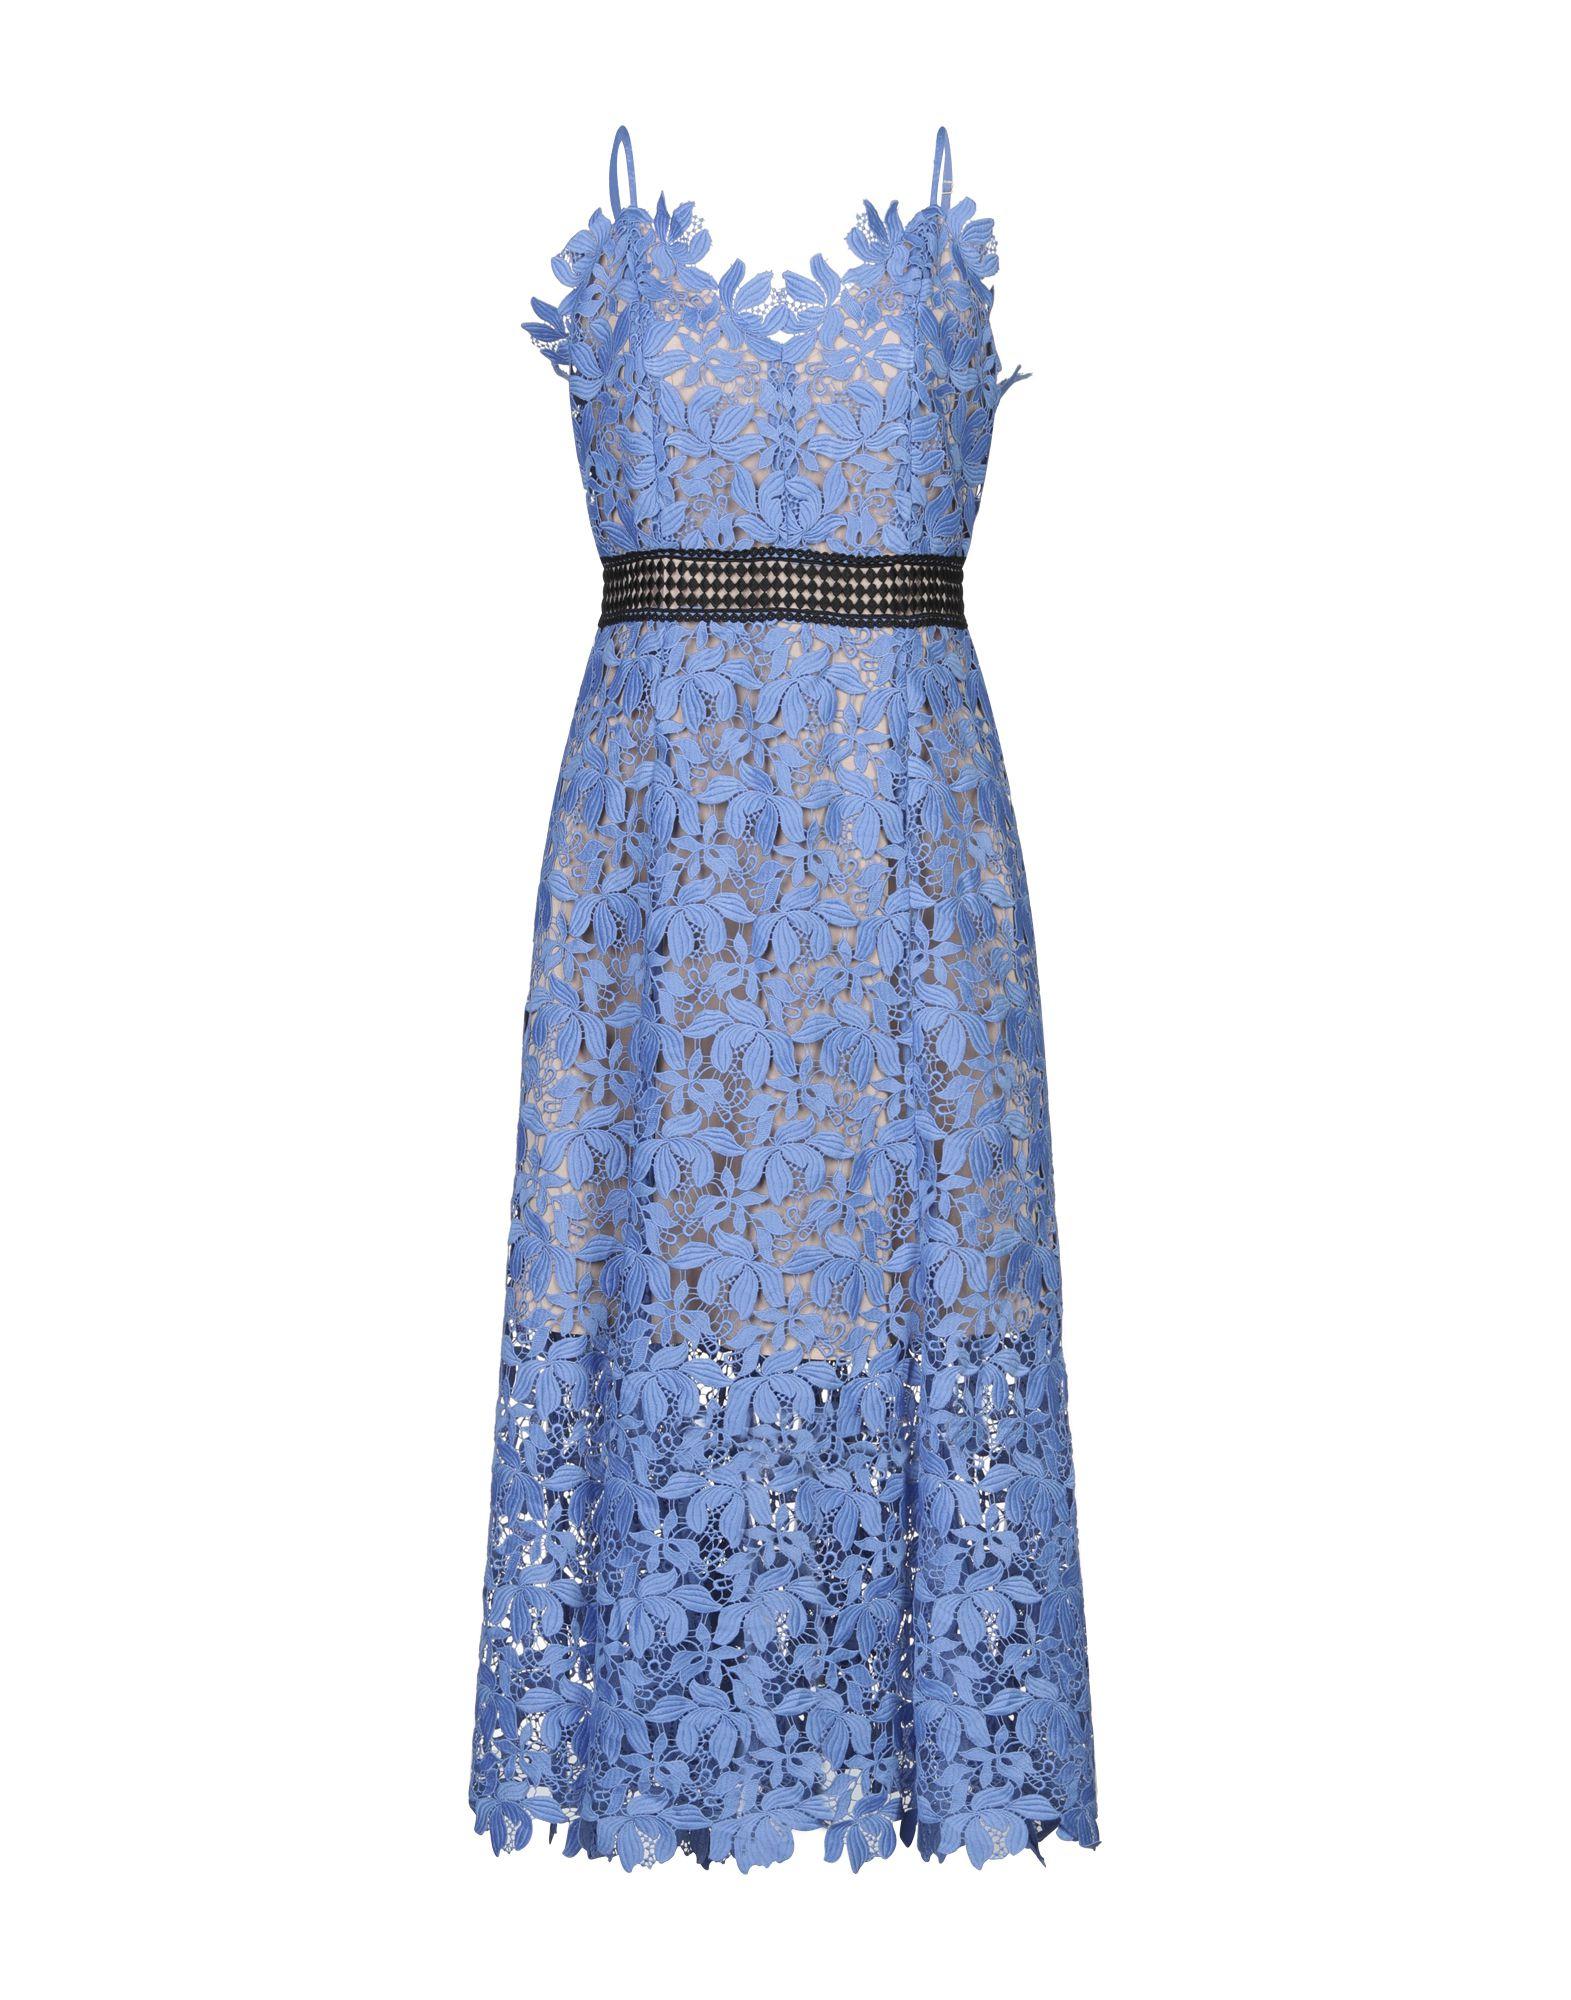 ISABELLE BLANCHE Paris Платье длиной 3/4